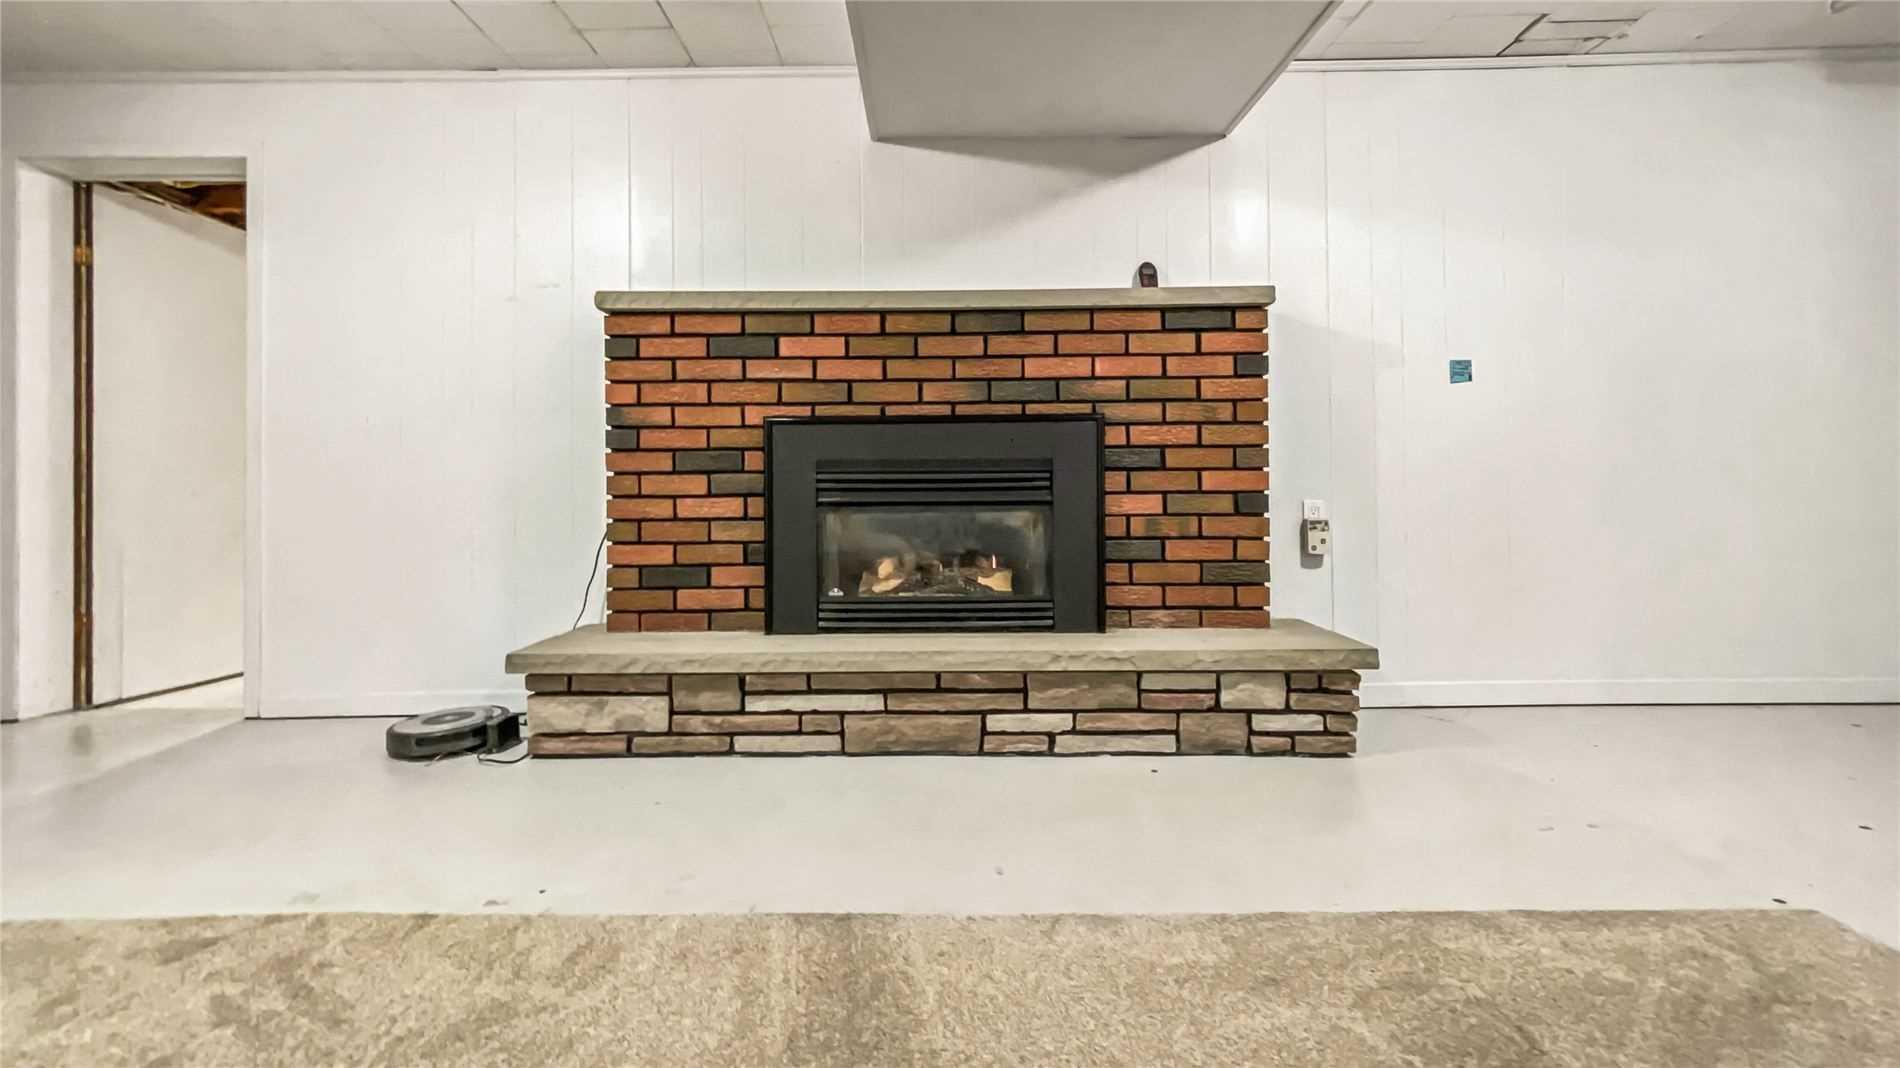 Detached house For Sale In Orangeville - 240 Zina St, Orangeville, Ontario, Canada L9W1G1 , 3 Bedrooms Bedrooms, ,2 BathroomsBathrooms,Detached,For Sale,Zina